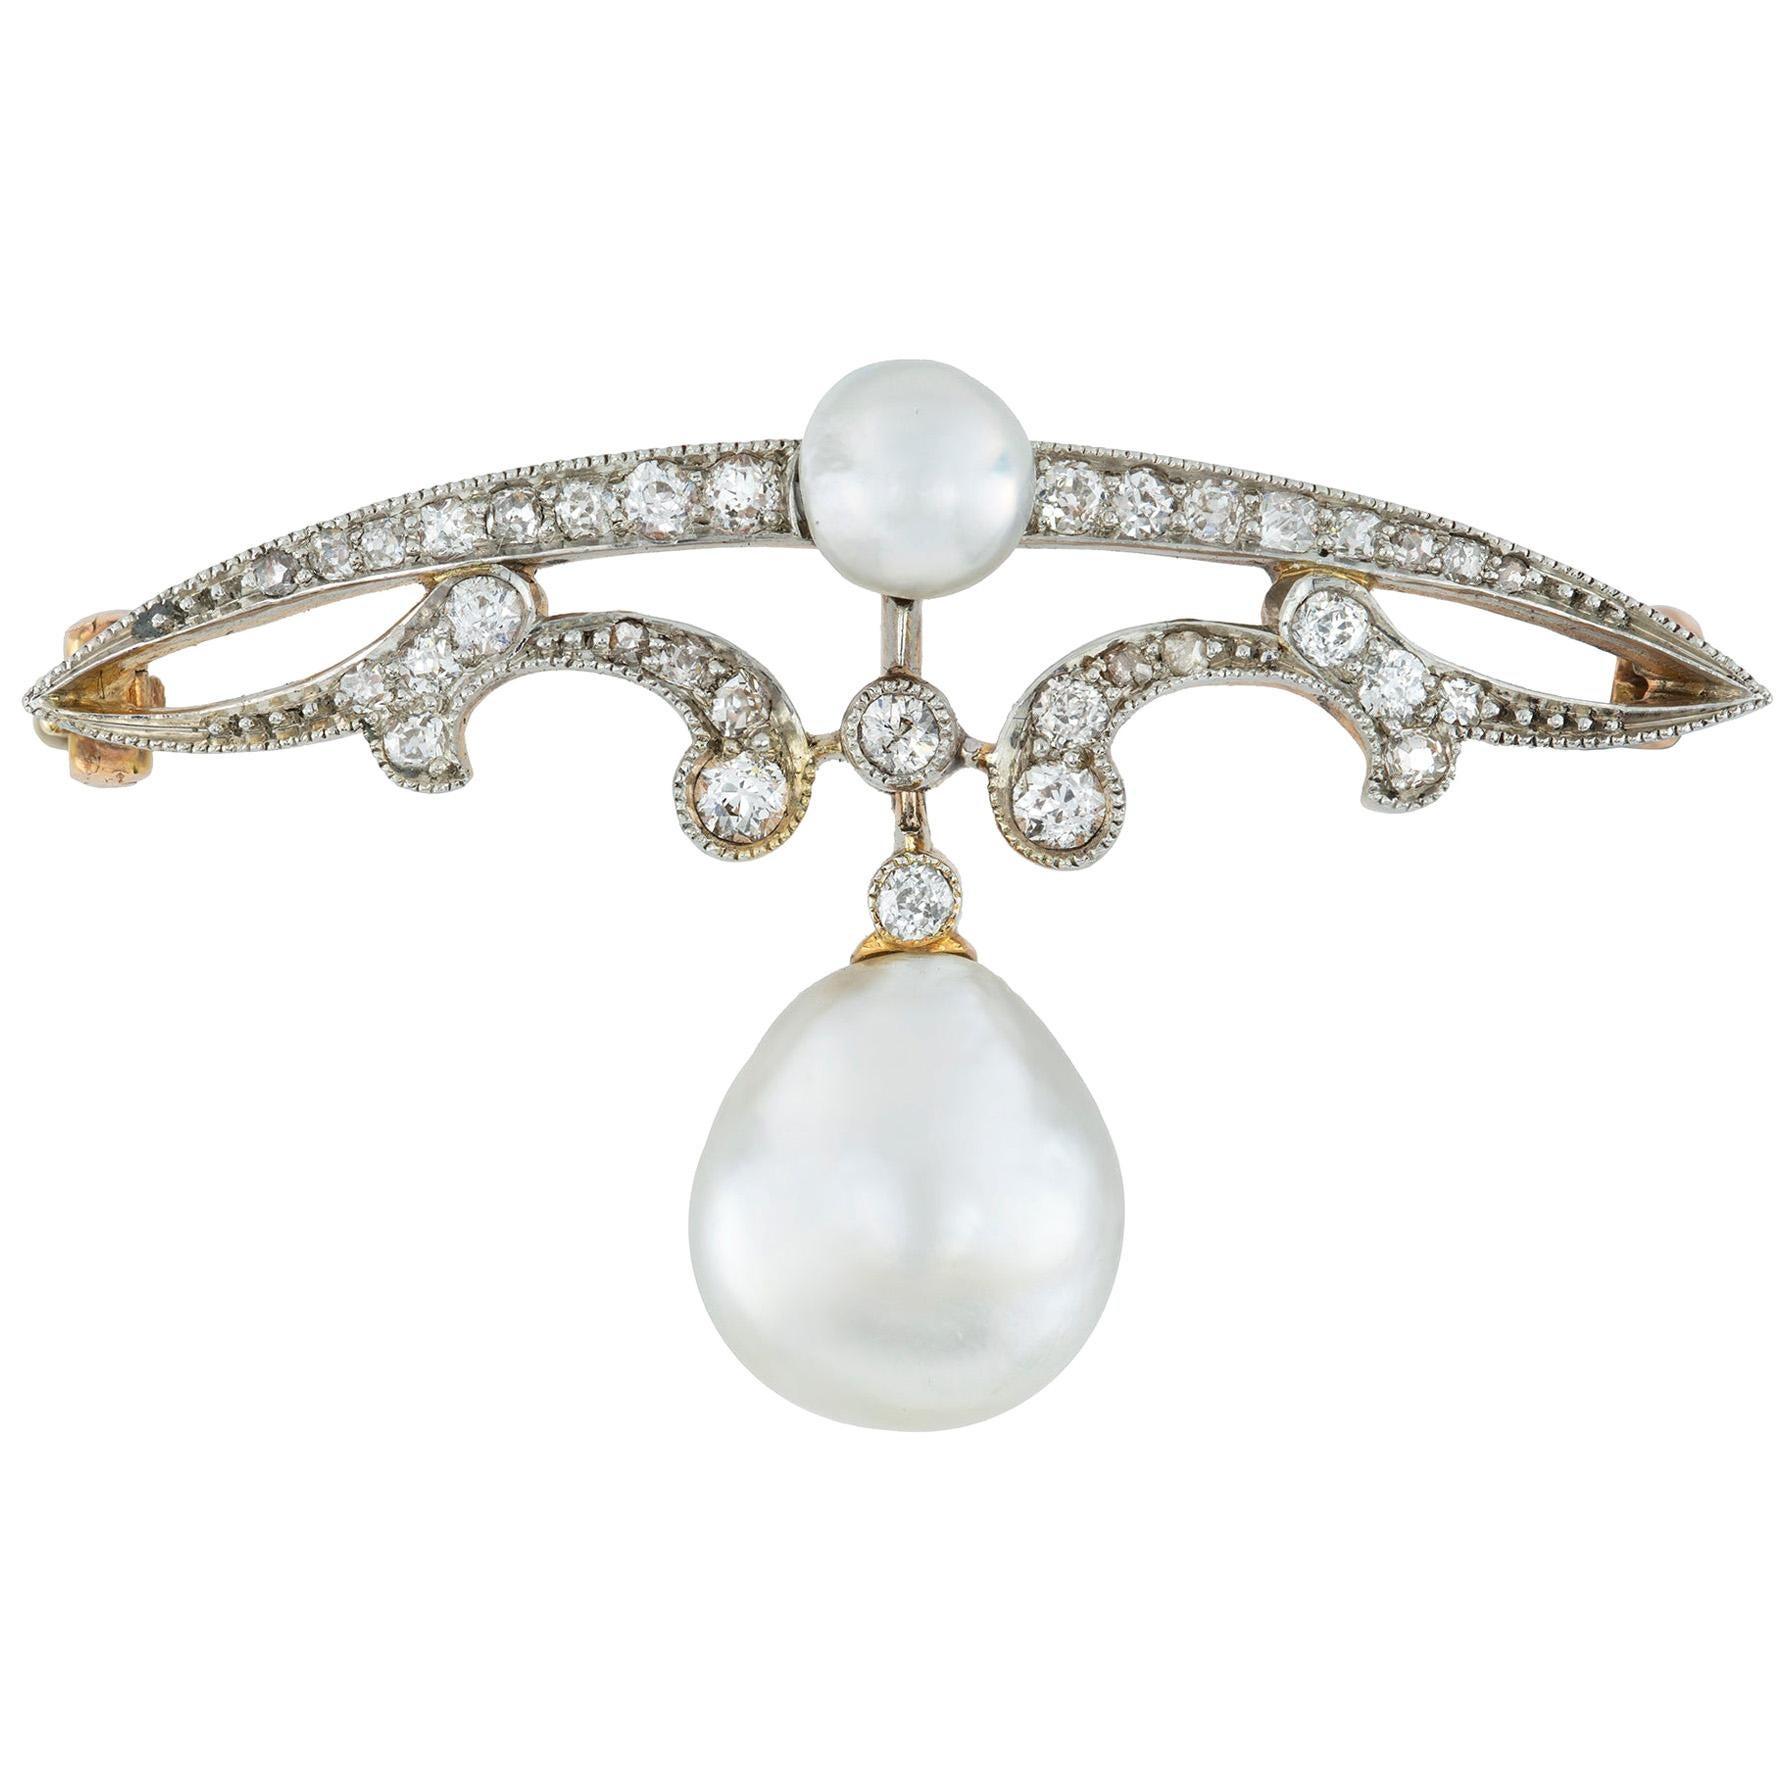 Edwardian Natural Pearl and Diamond Brooch